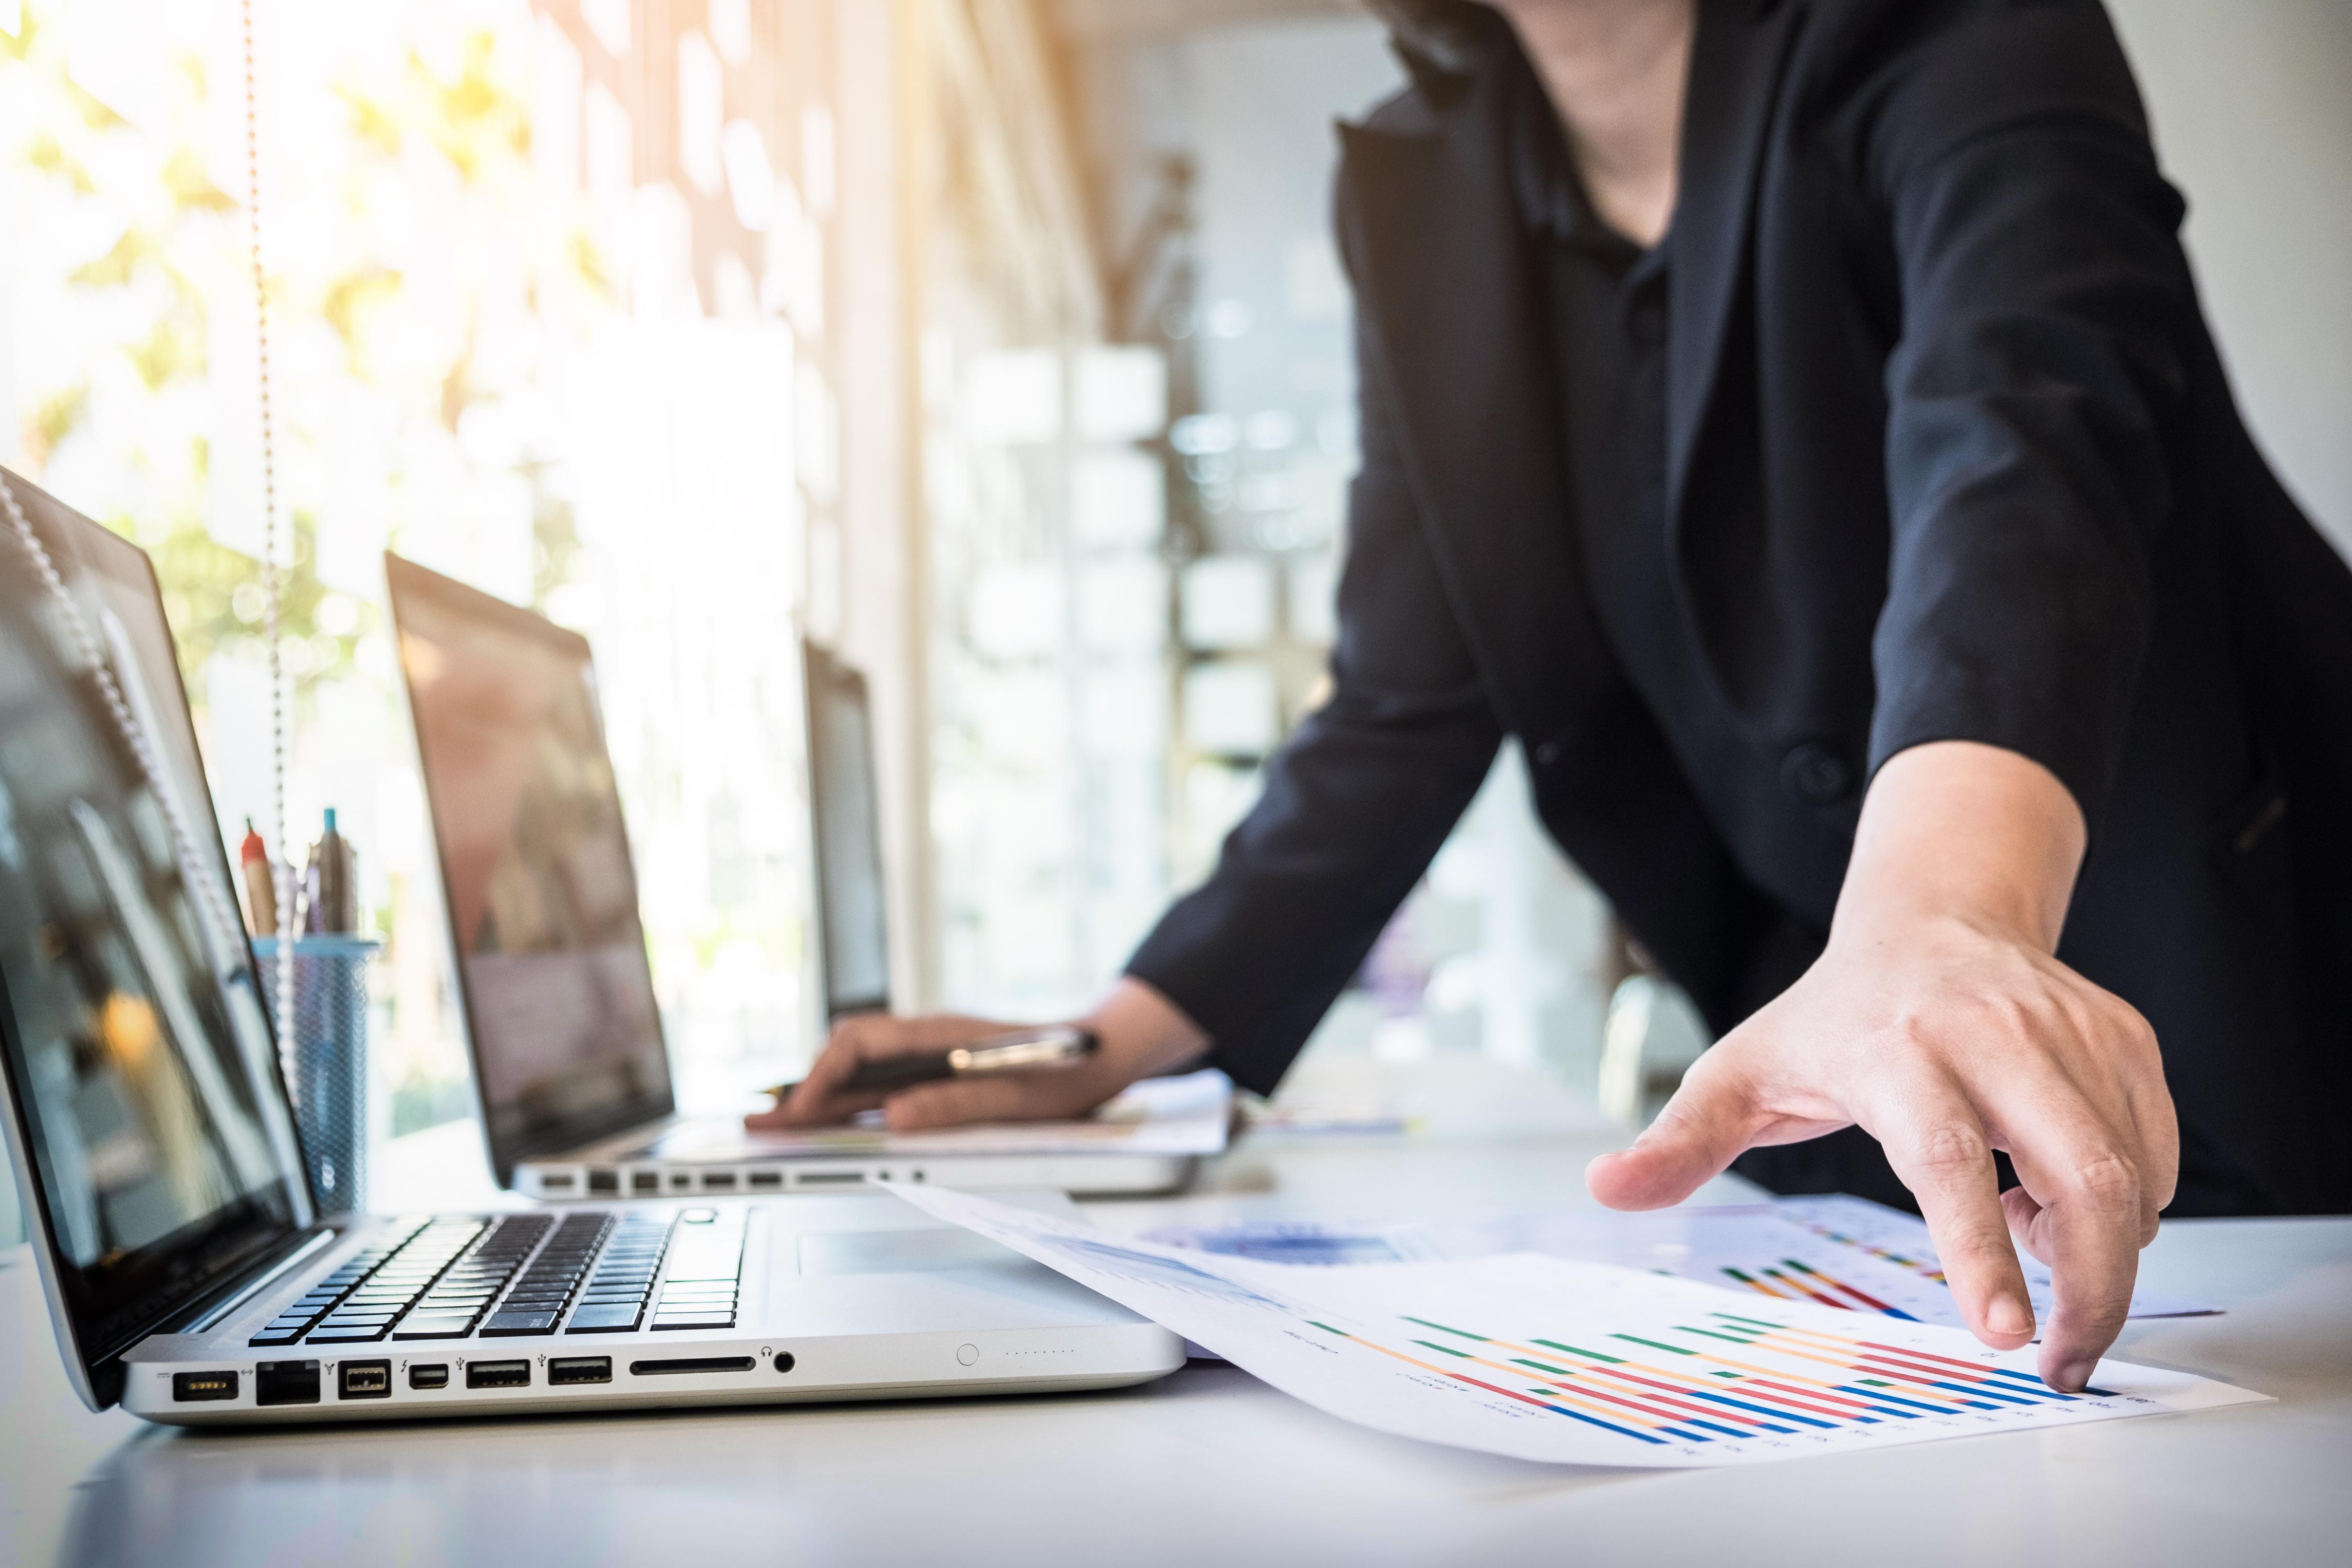 Power Pivot & Query En Excel para trabajar en Business Intelligence de manera eficaz